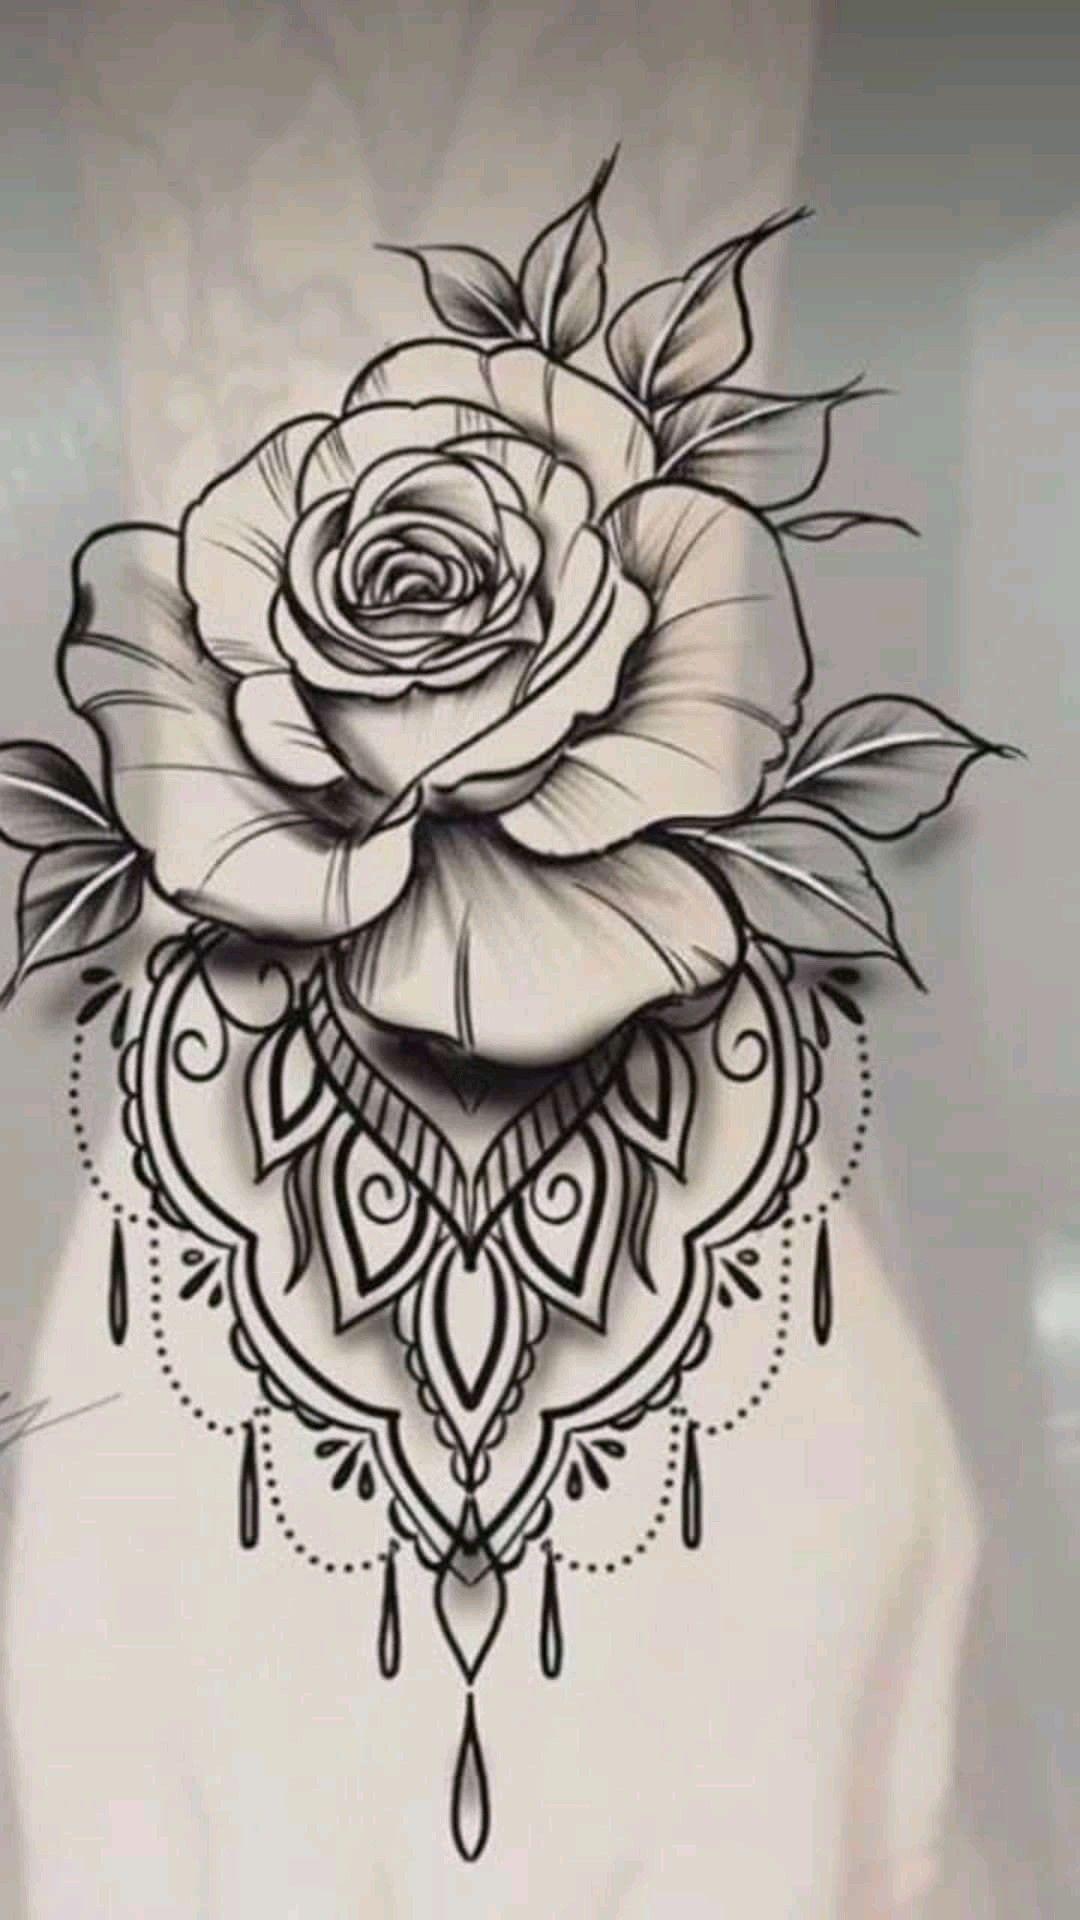 Pin By Raymola Brady On Tattoo Flower Wrist Tattoos Rose Tattoos For Men Tattoo Designs